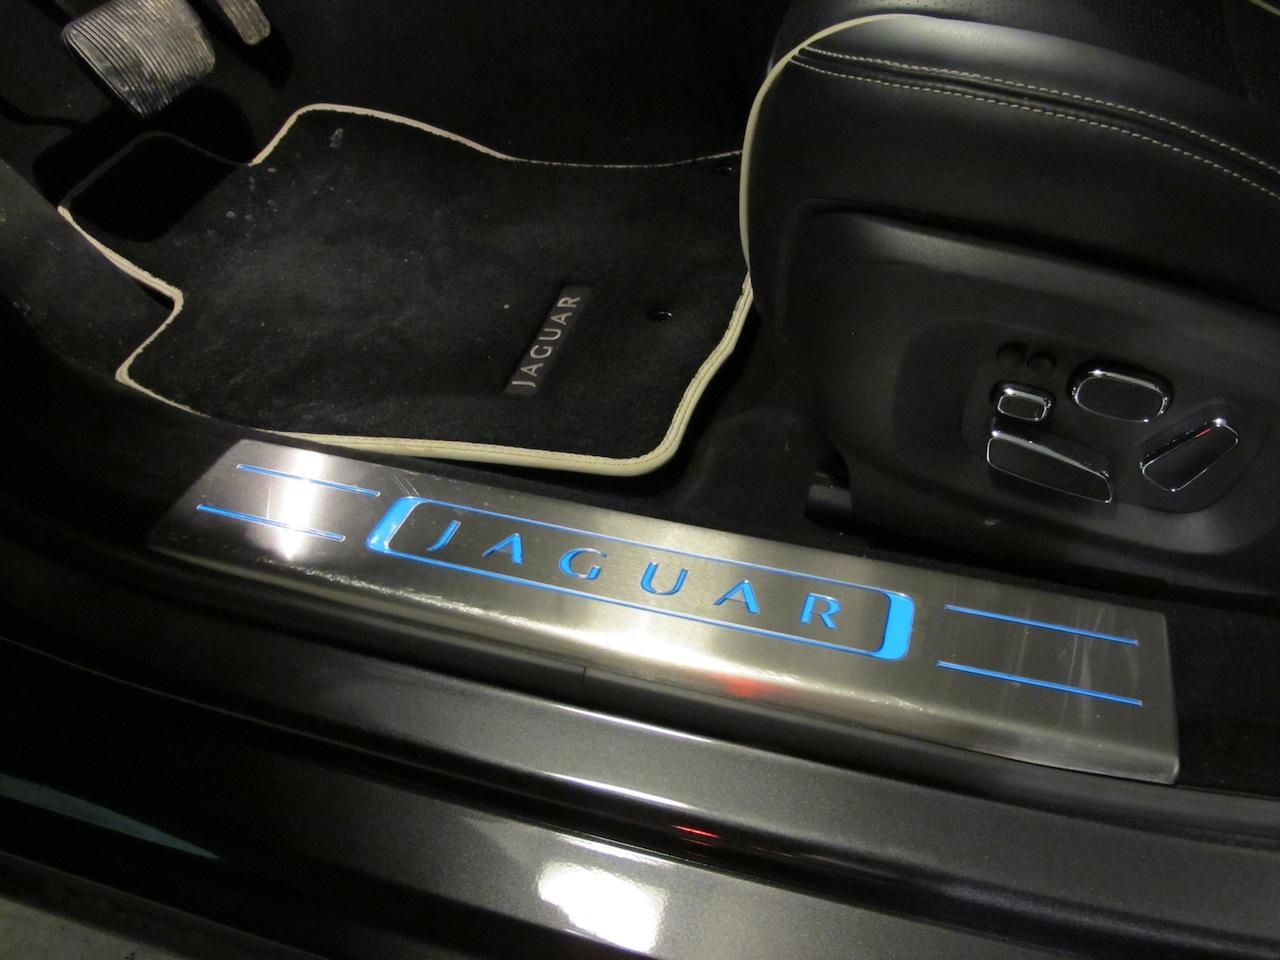 2013 積架 Jaguar Xj Awd Review Cars Photos Test Drives